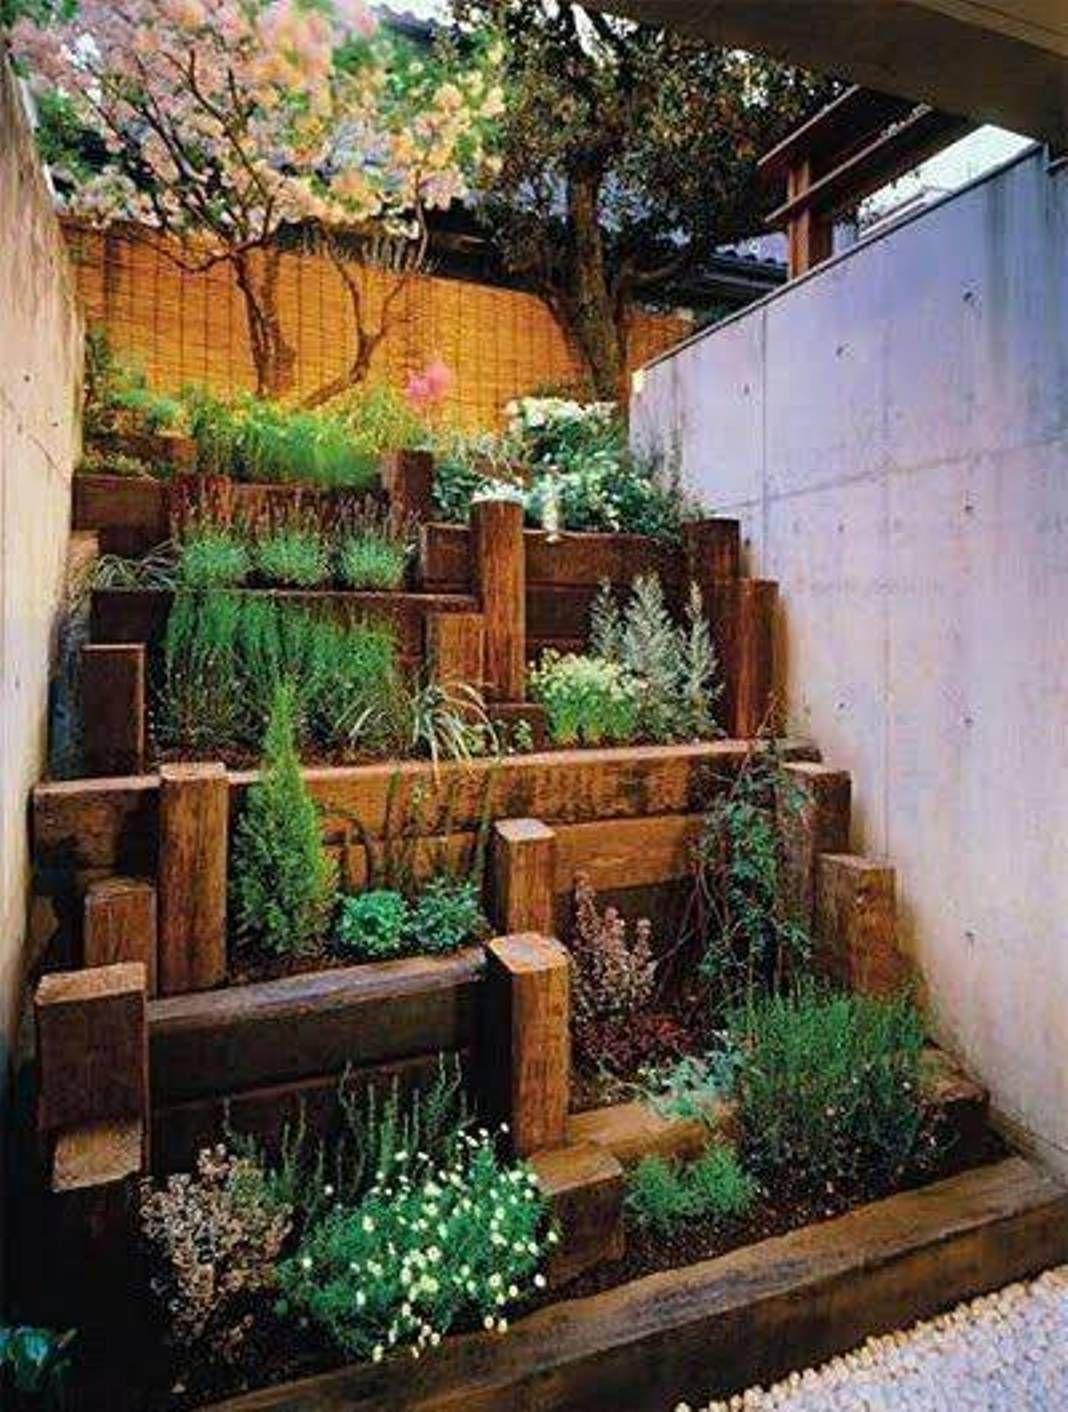 Great idea for a small succulent garden Design. More depth